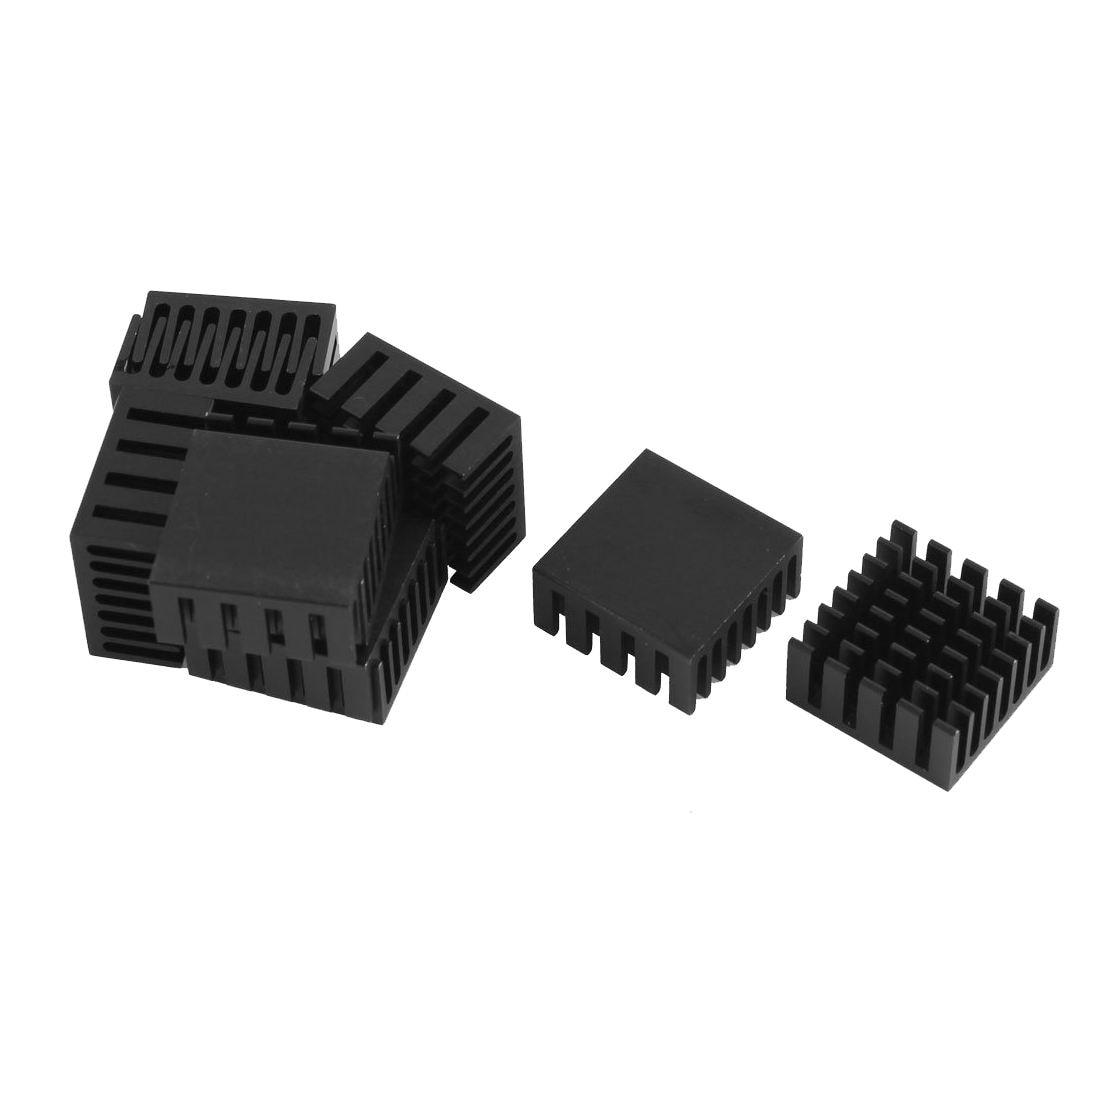 10 Pcs Black Aluminum Cooler Radiator Heat Sink Heatsink 20mm x 20mm x 10mm